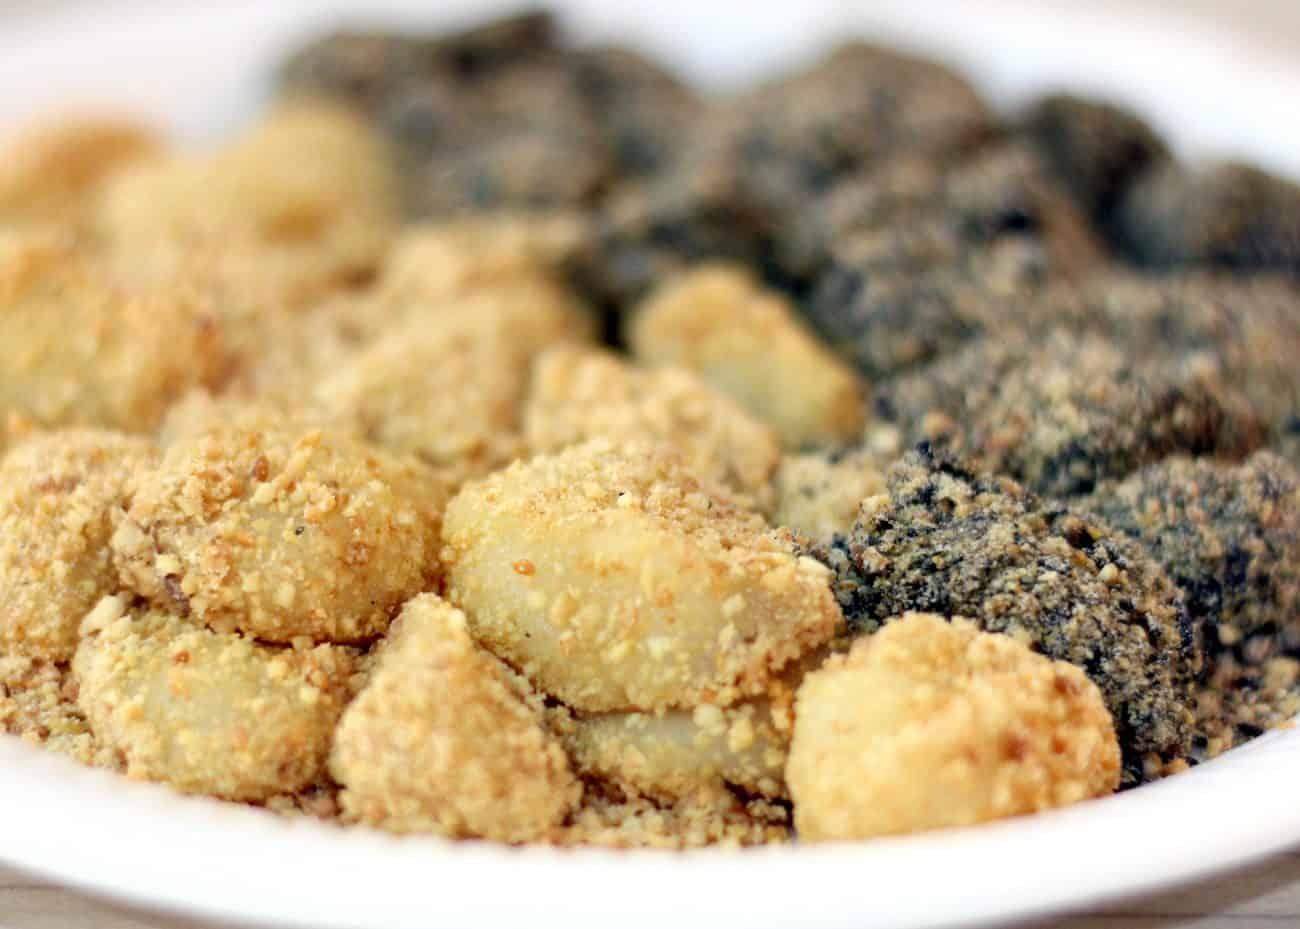 hougang-muah-chee-peanut-black-sesame-1300x929.jpg